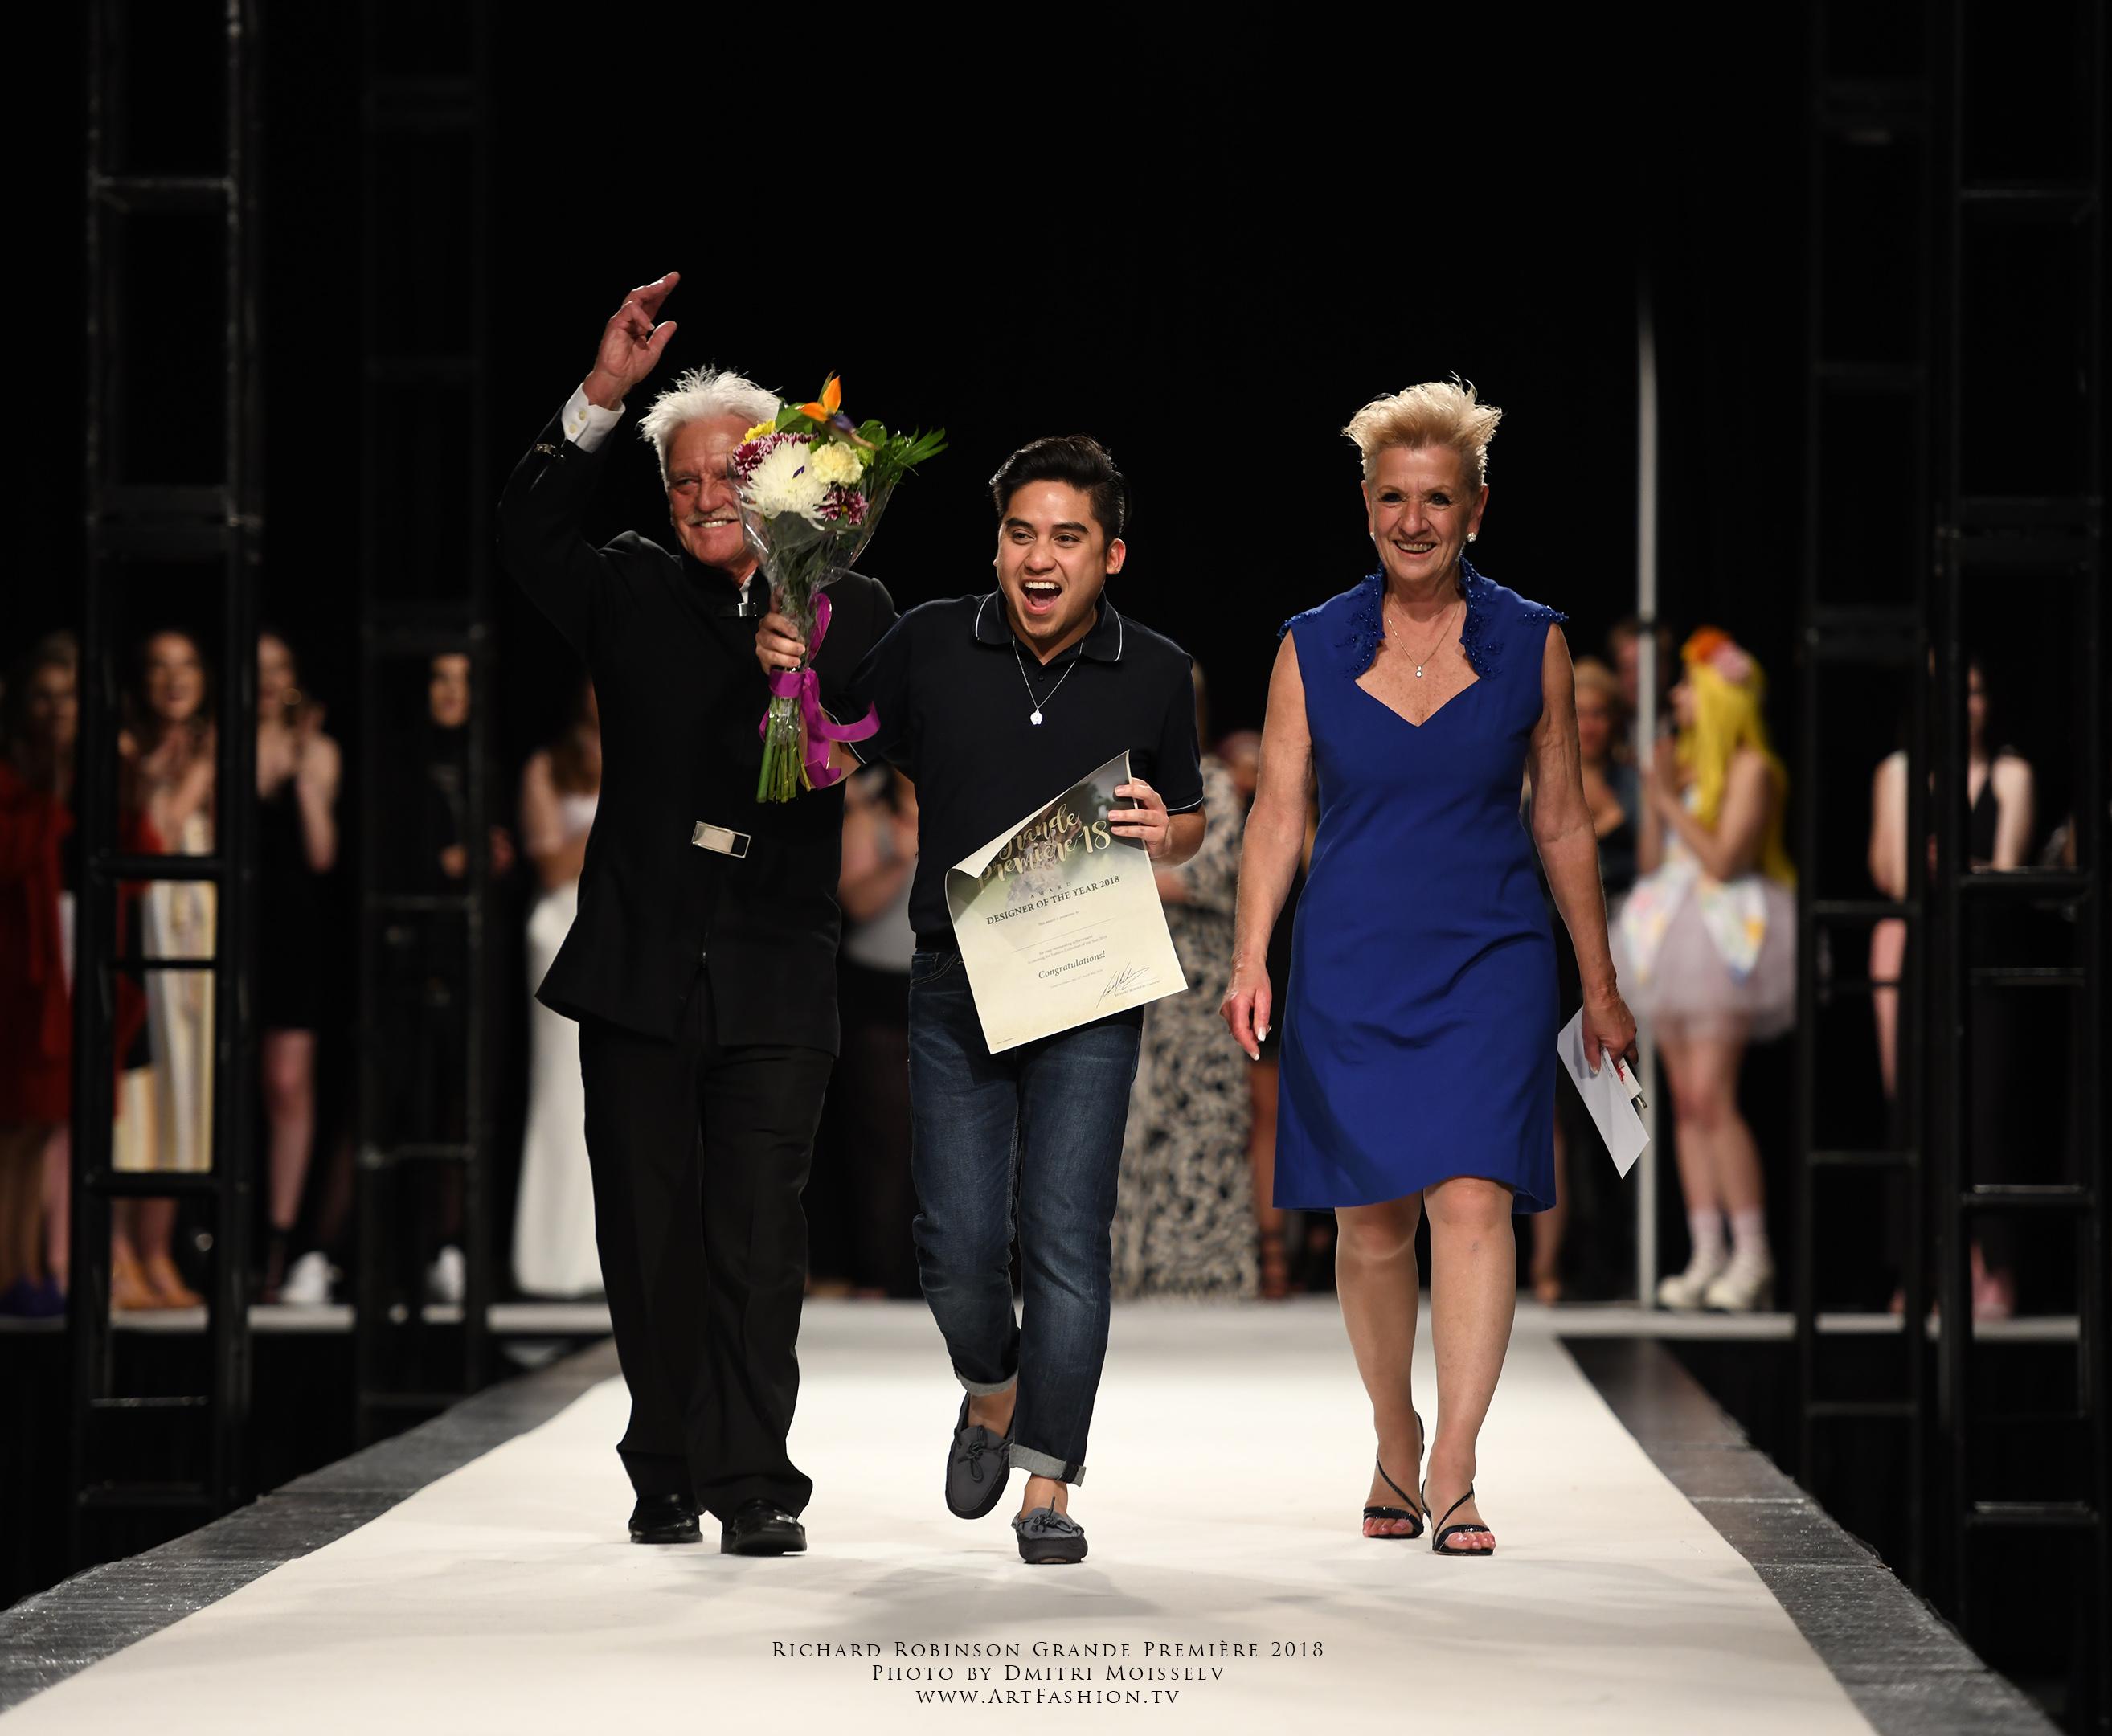 Annual Richard Robinson Grande Premiere 2018 Fashion Show Lifestyle By Diana